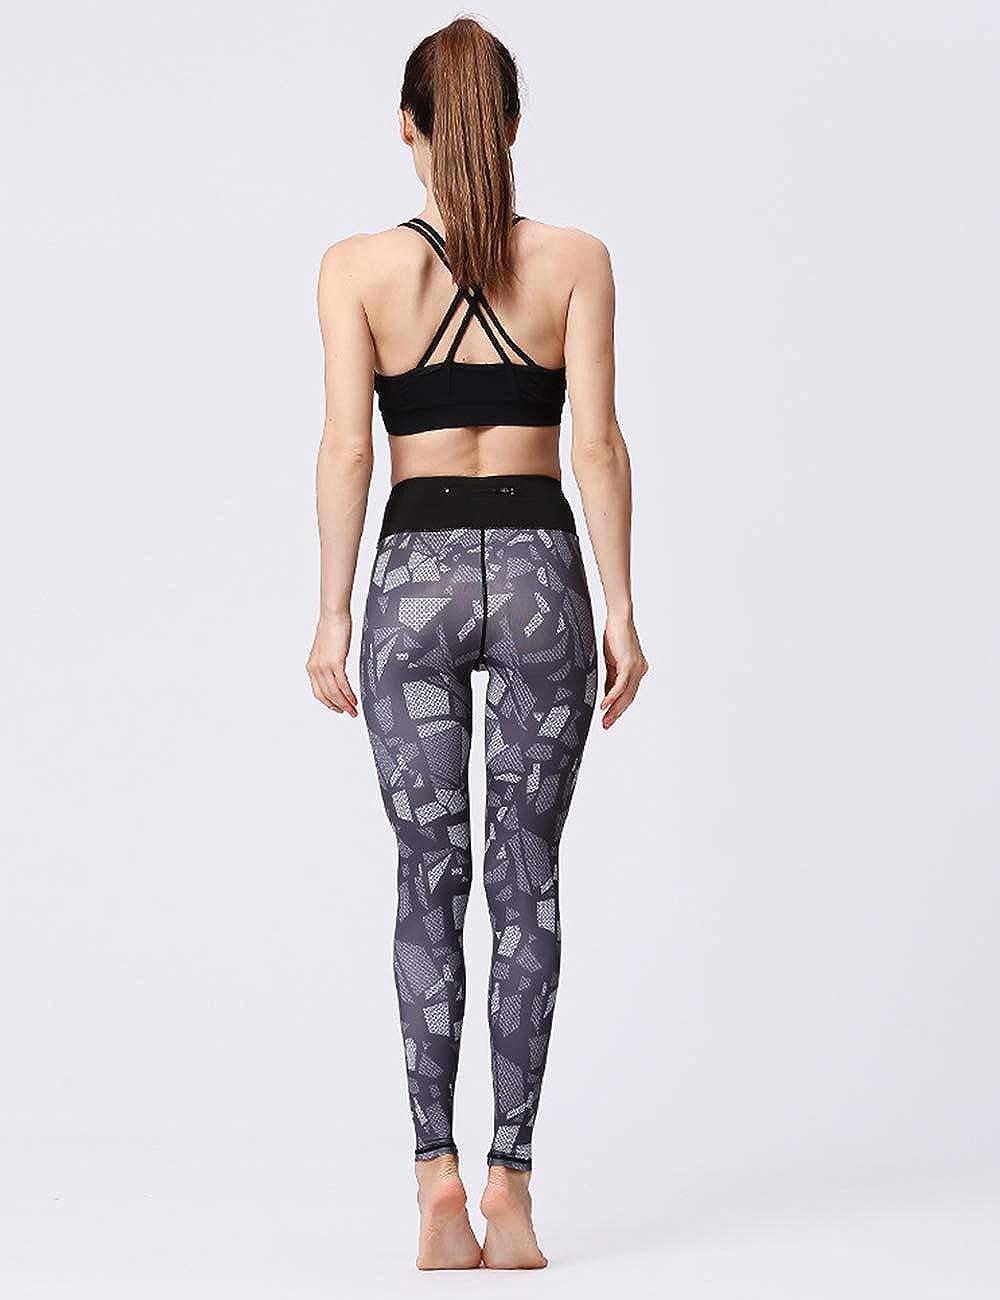 Mujeres Activo Atl/ético Gimnasio Deportes Aptitud Pantalones besbomig 3D Impresi/ón Corriendo Yoga Polainas Pantalones Tramo Rutina de Ejercicio Medias